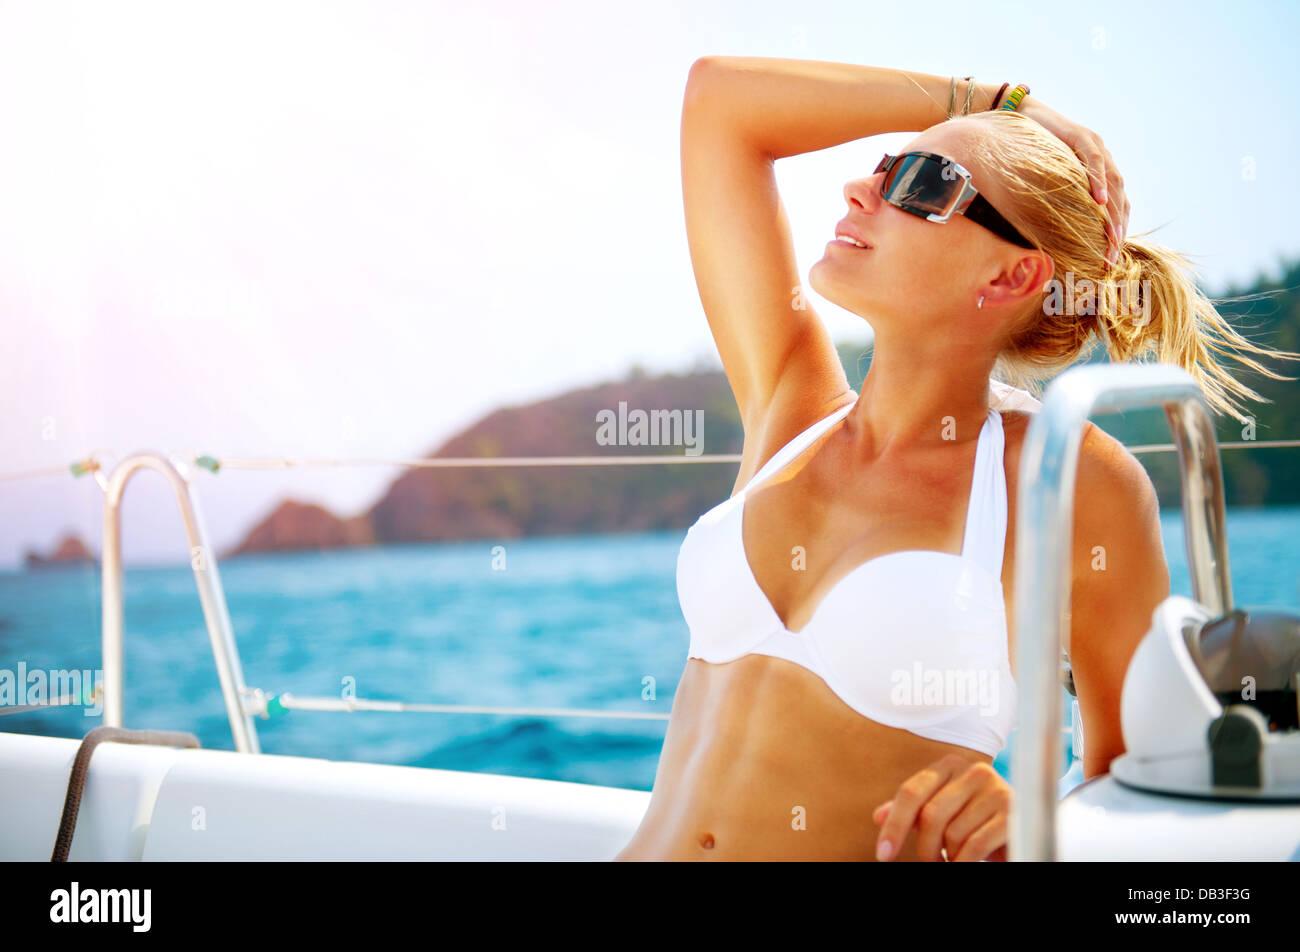 Beautiful Girl resting on the Yacht. Yachting. Luxury Lifestyle - Stock Image